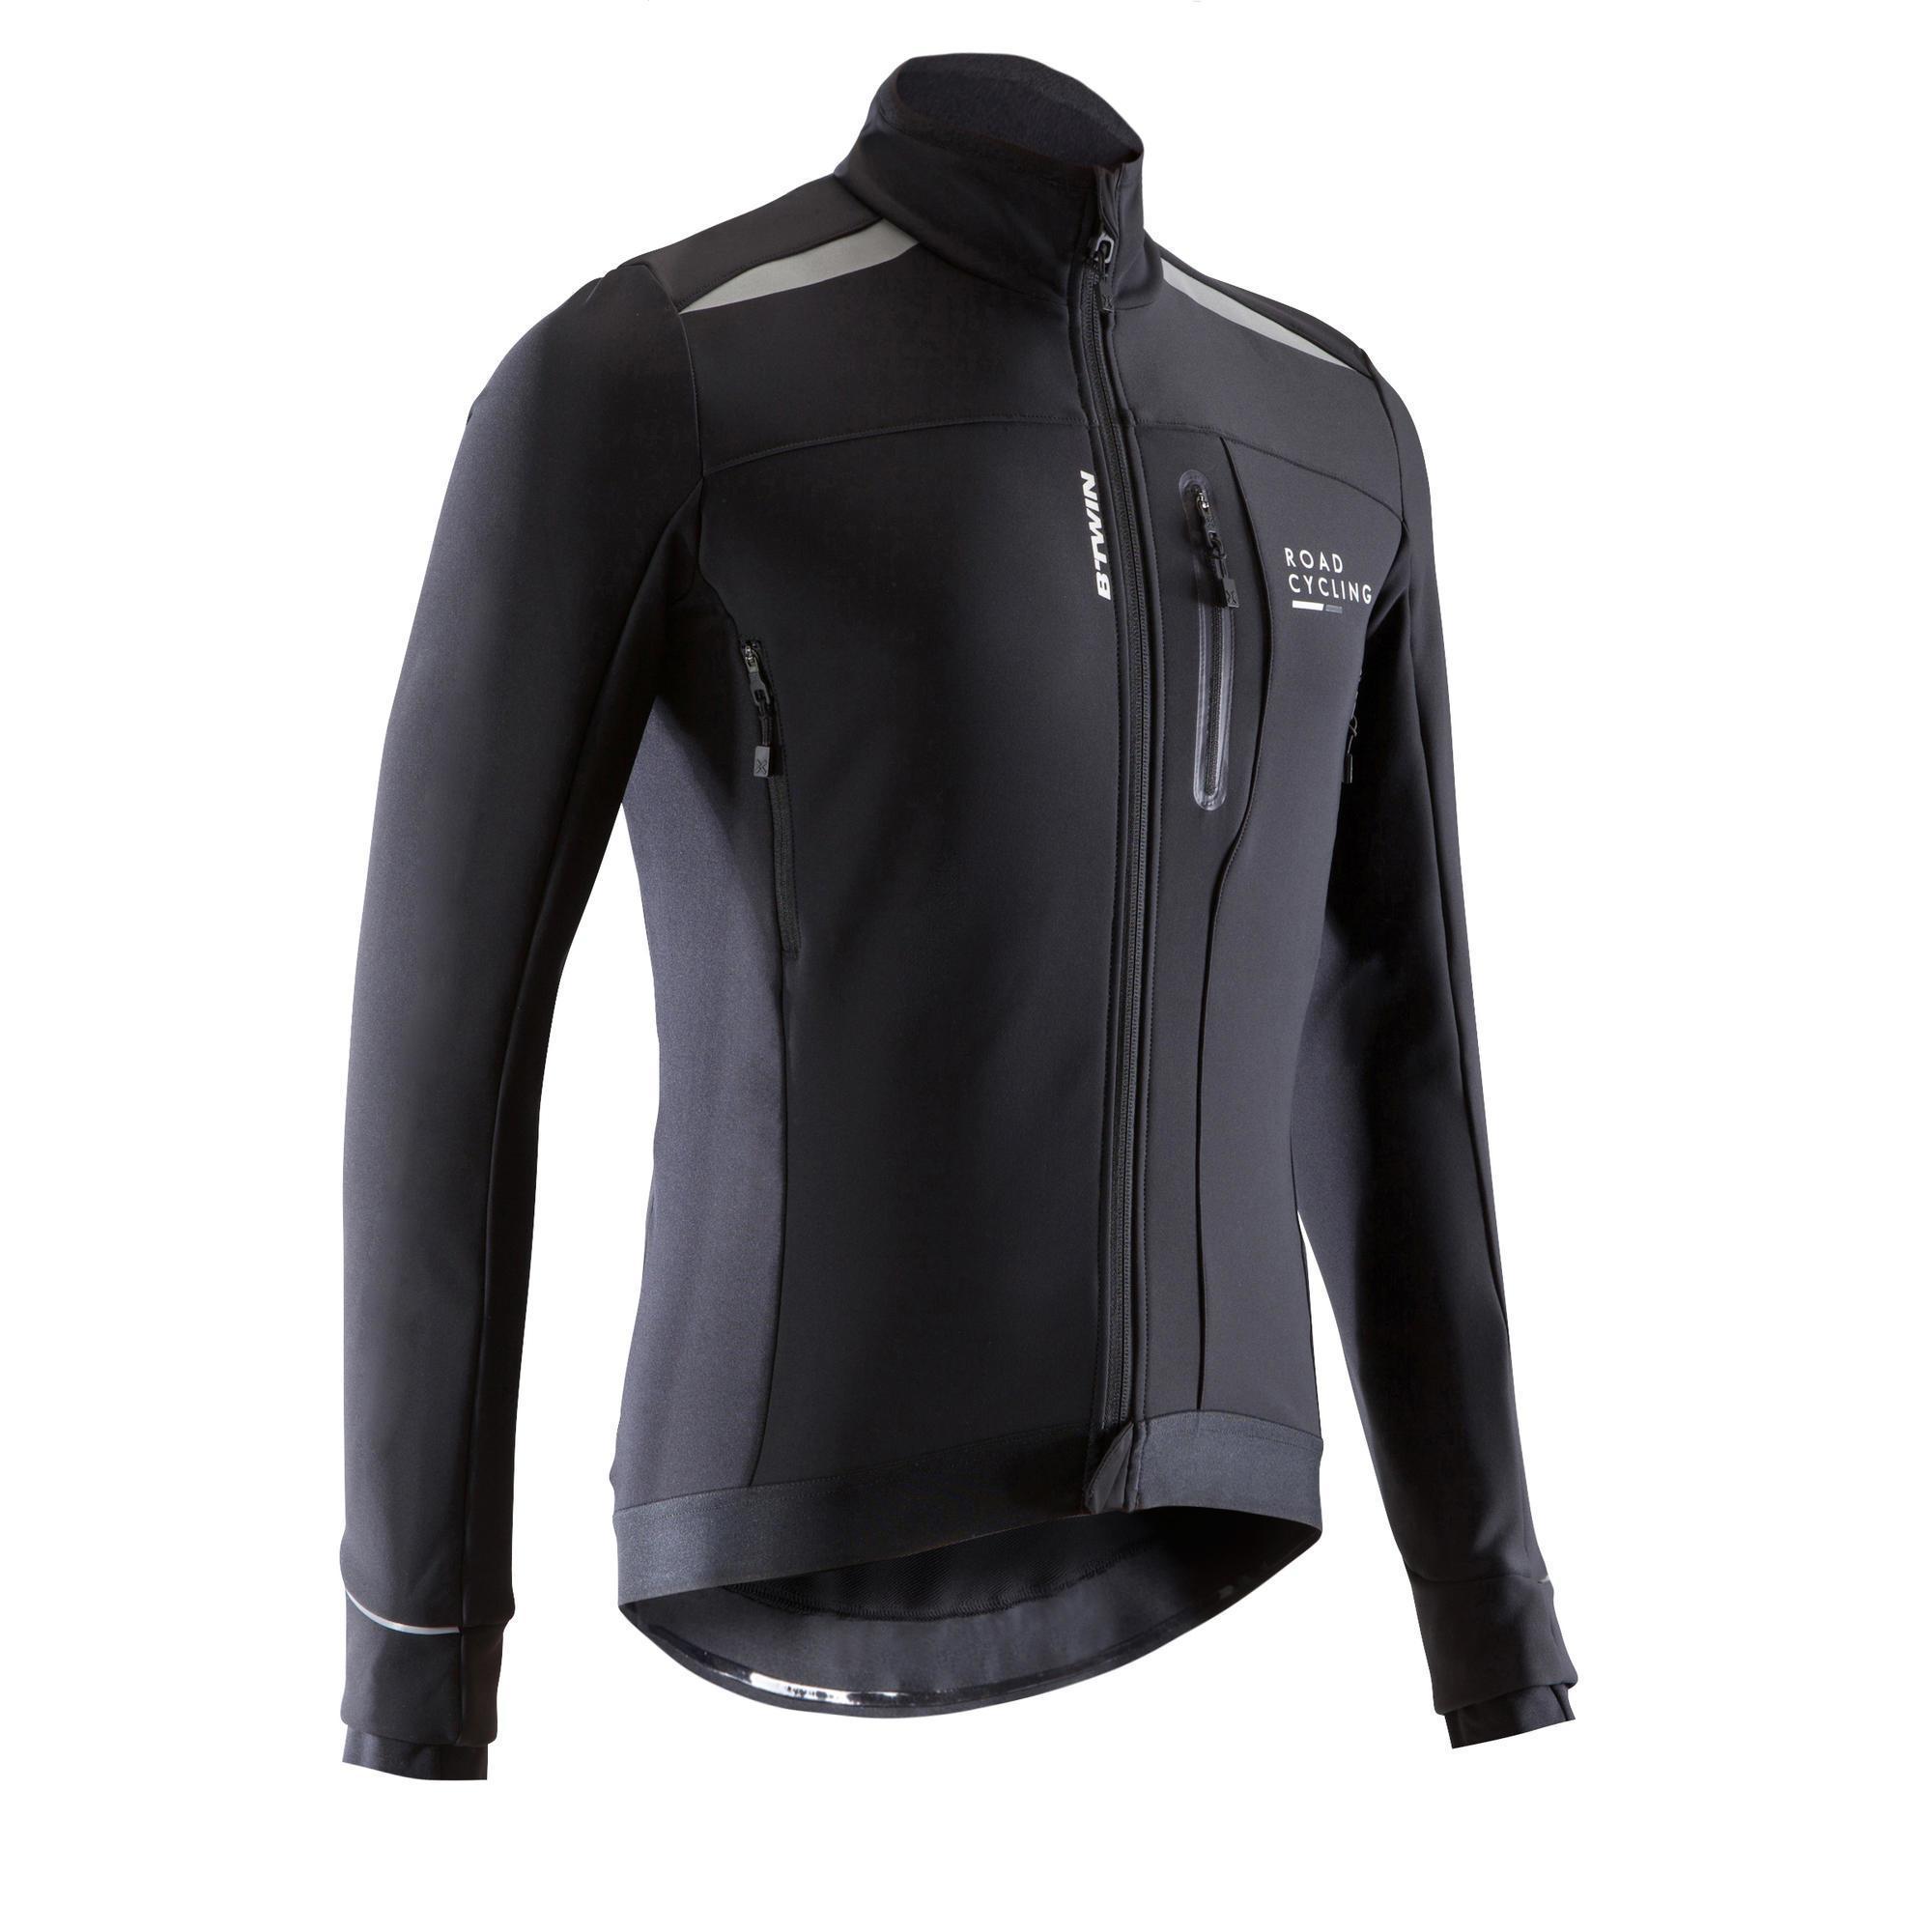 Comprar Chaqueta Ciclismo Invierno Online  14f9f0ef51e